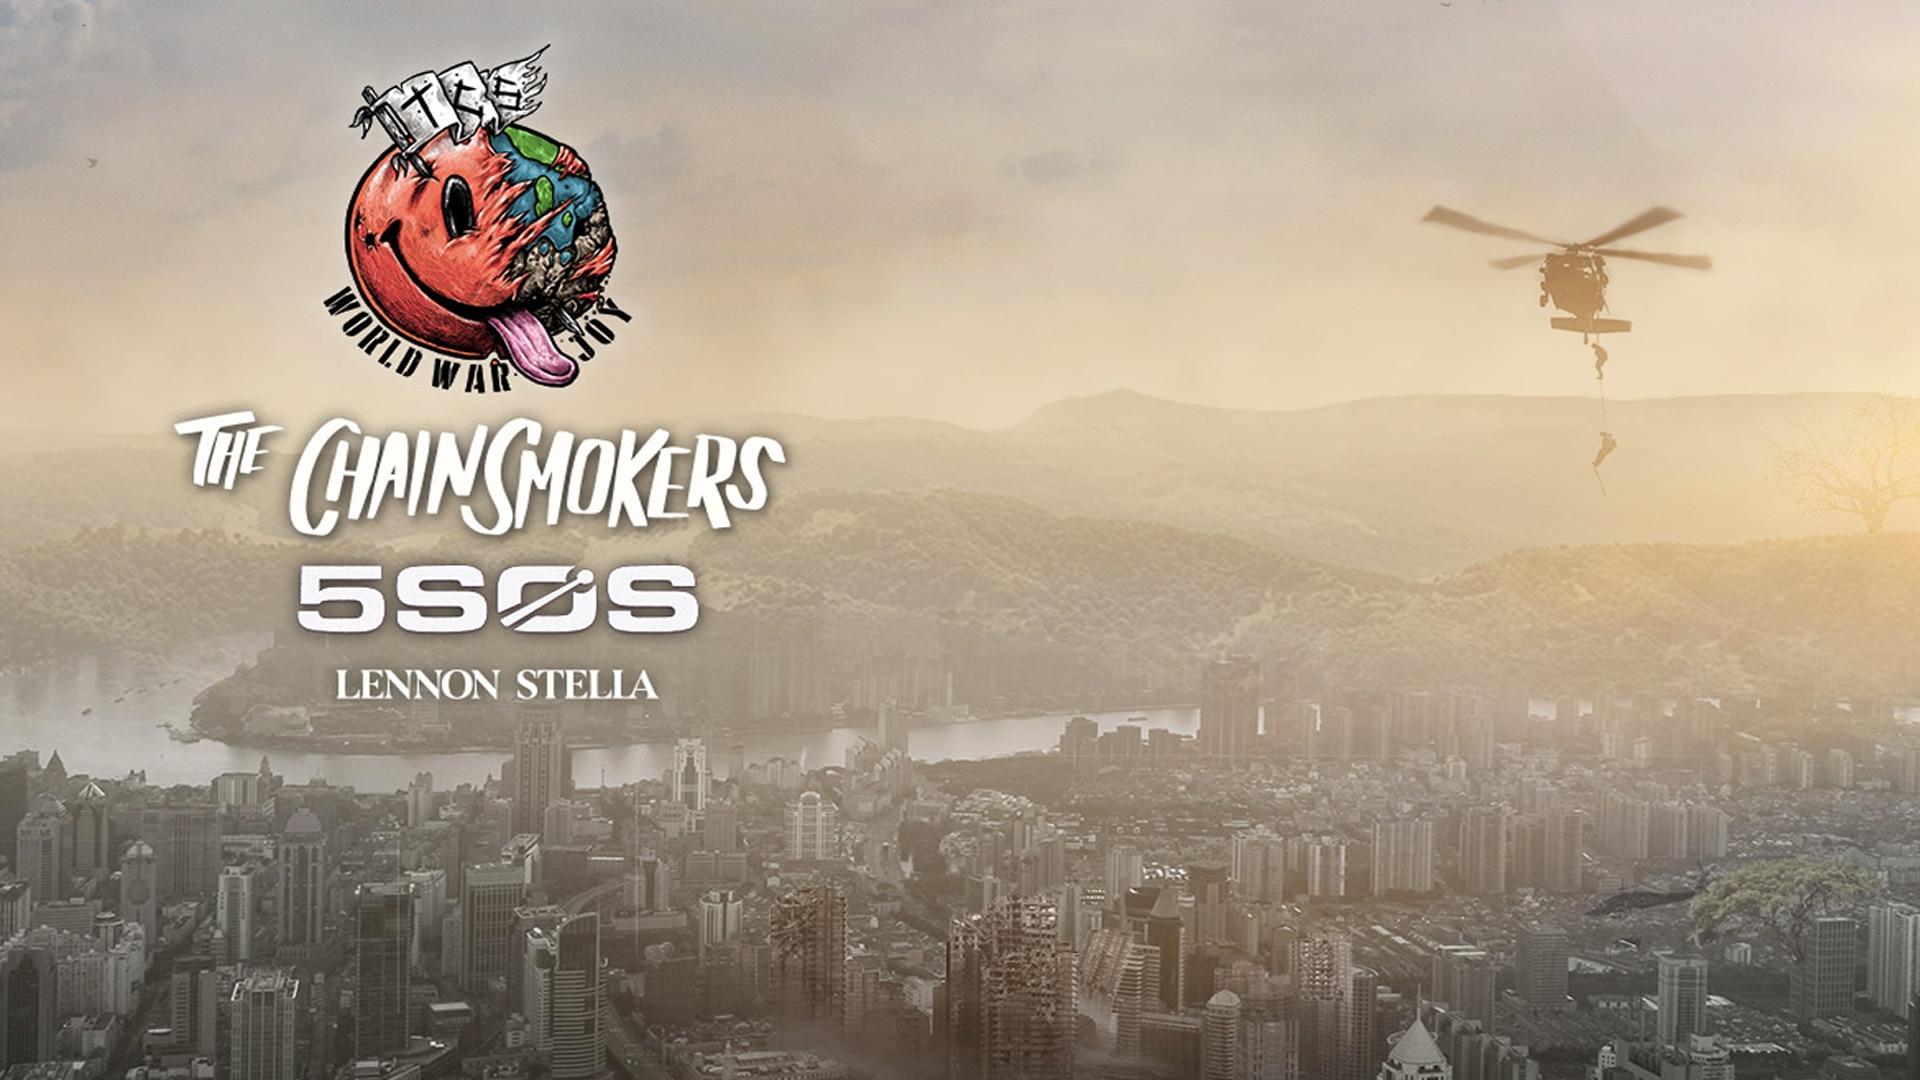 The Chainsmokers 2019: World War Joy